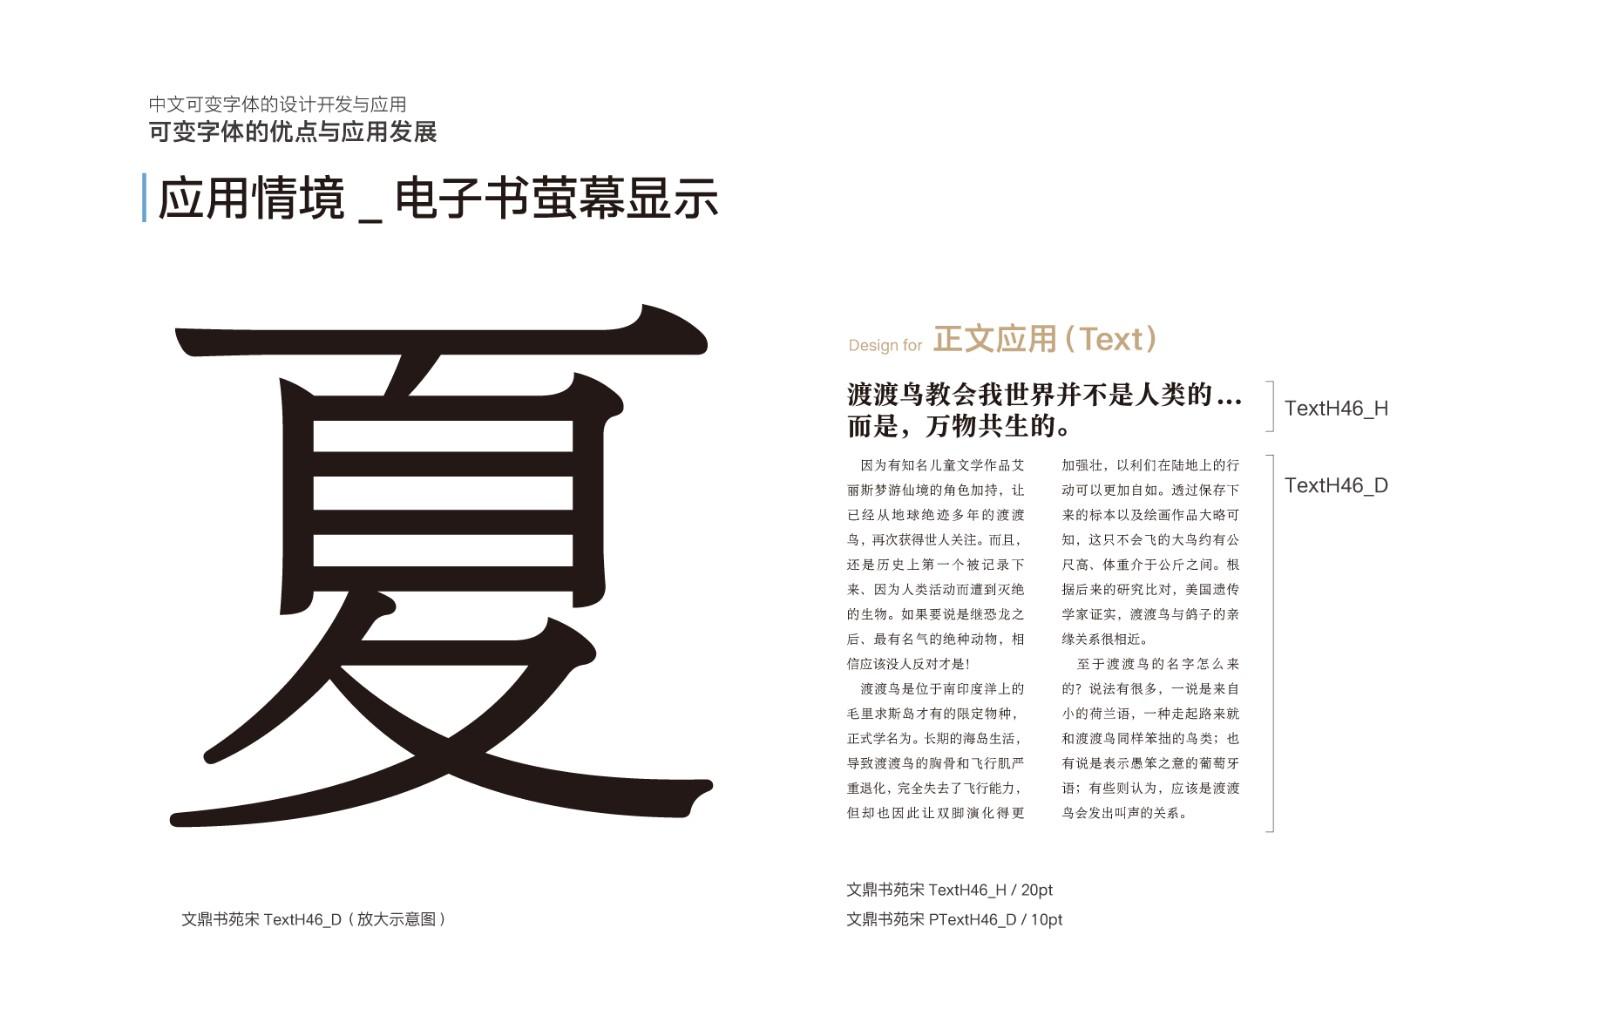 https://ft-bk1.oss-cn-zhangjiakou.aliyuncs.com/Public/Uploads/img/n_content_20201210110352_2692.jpg